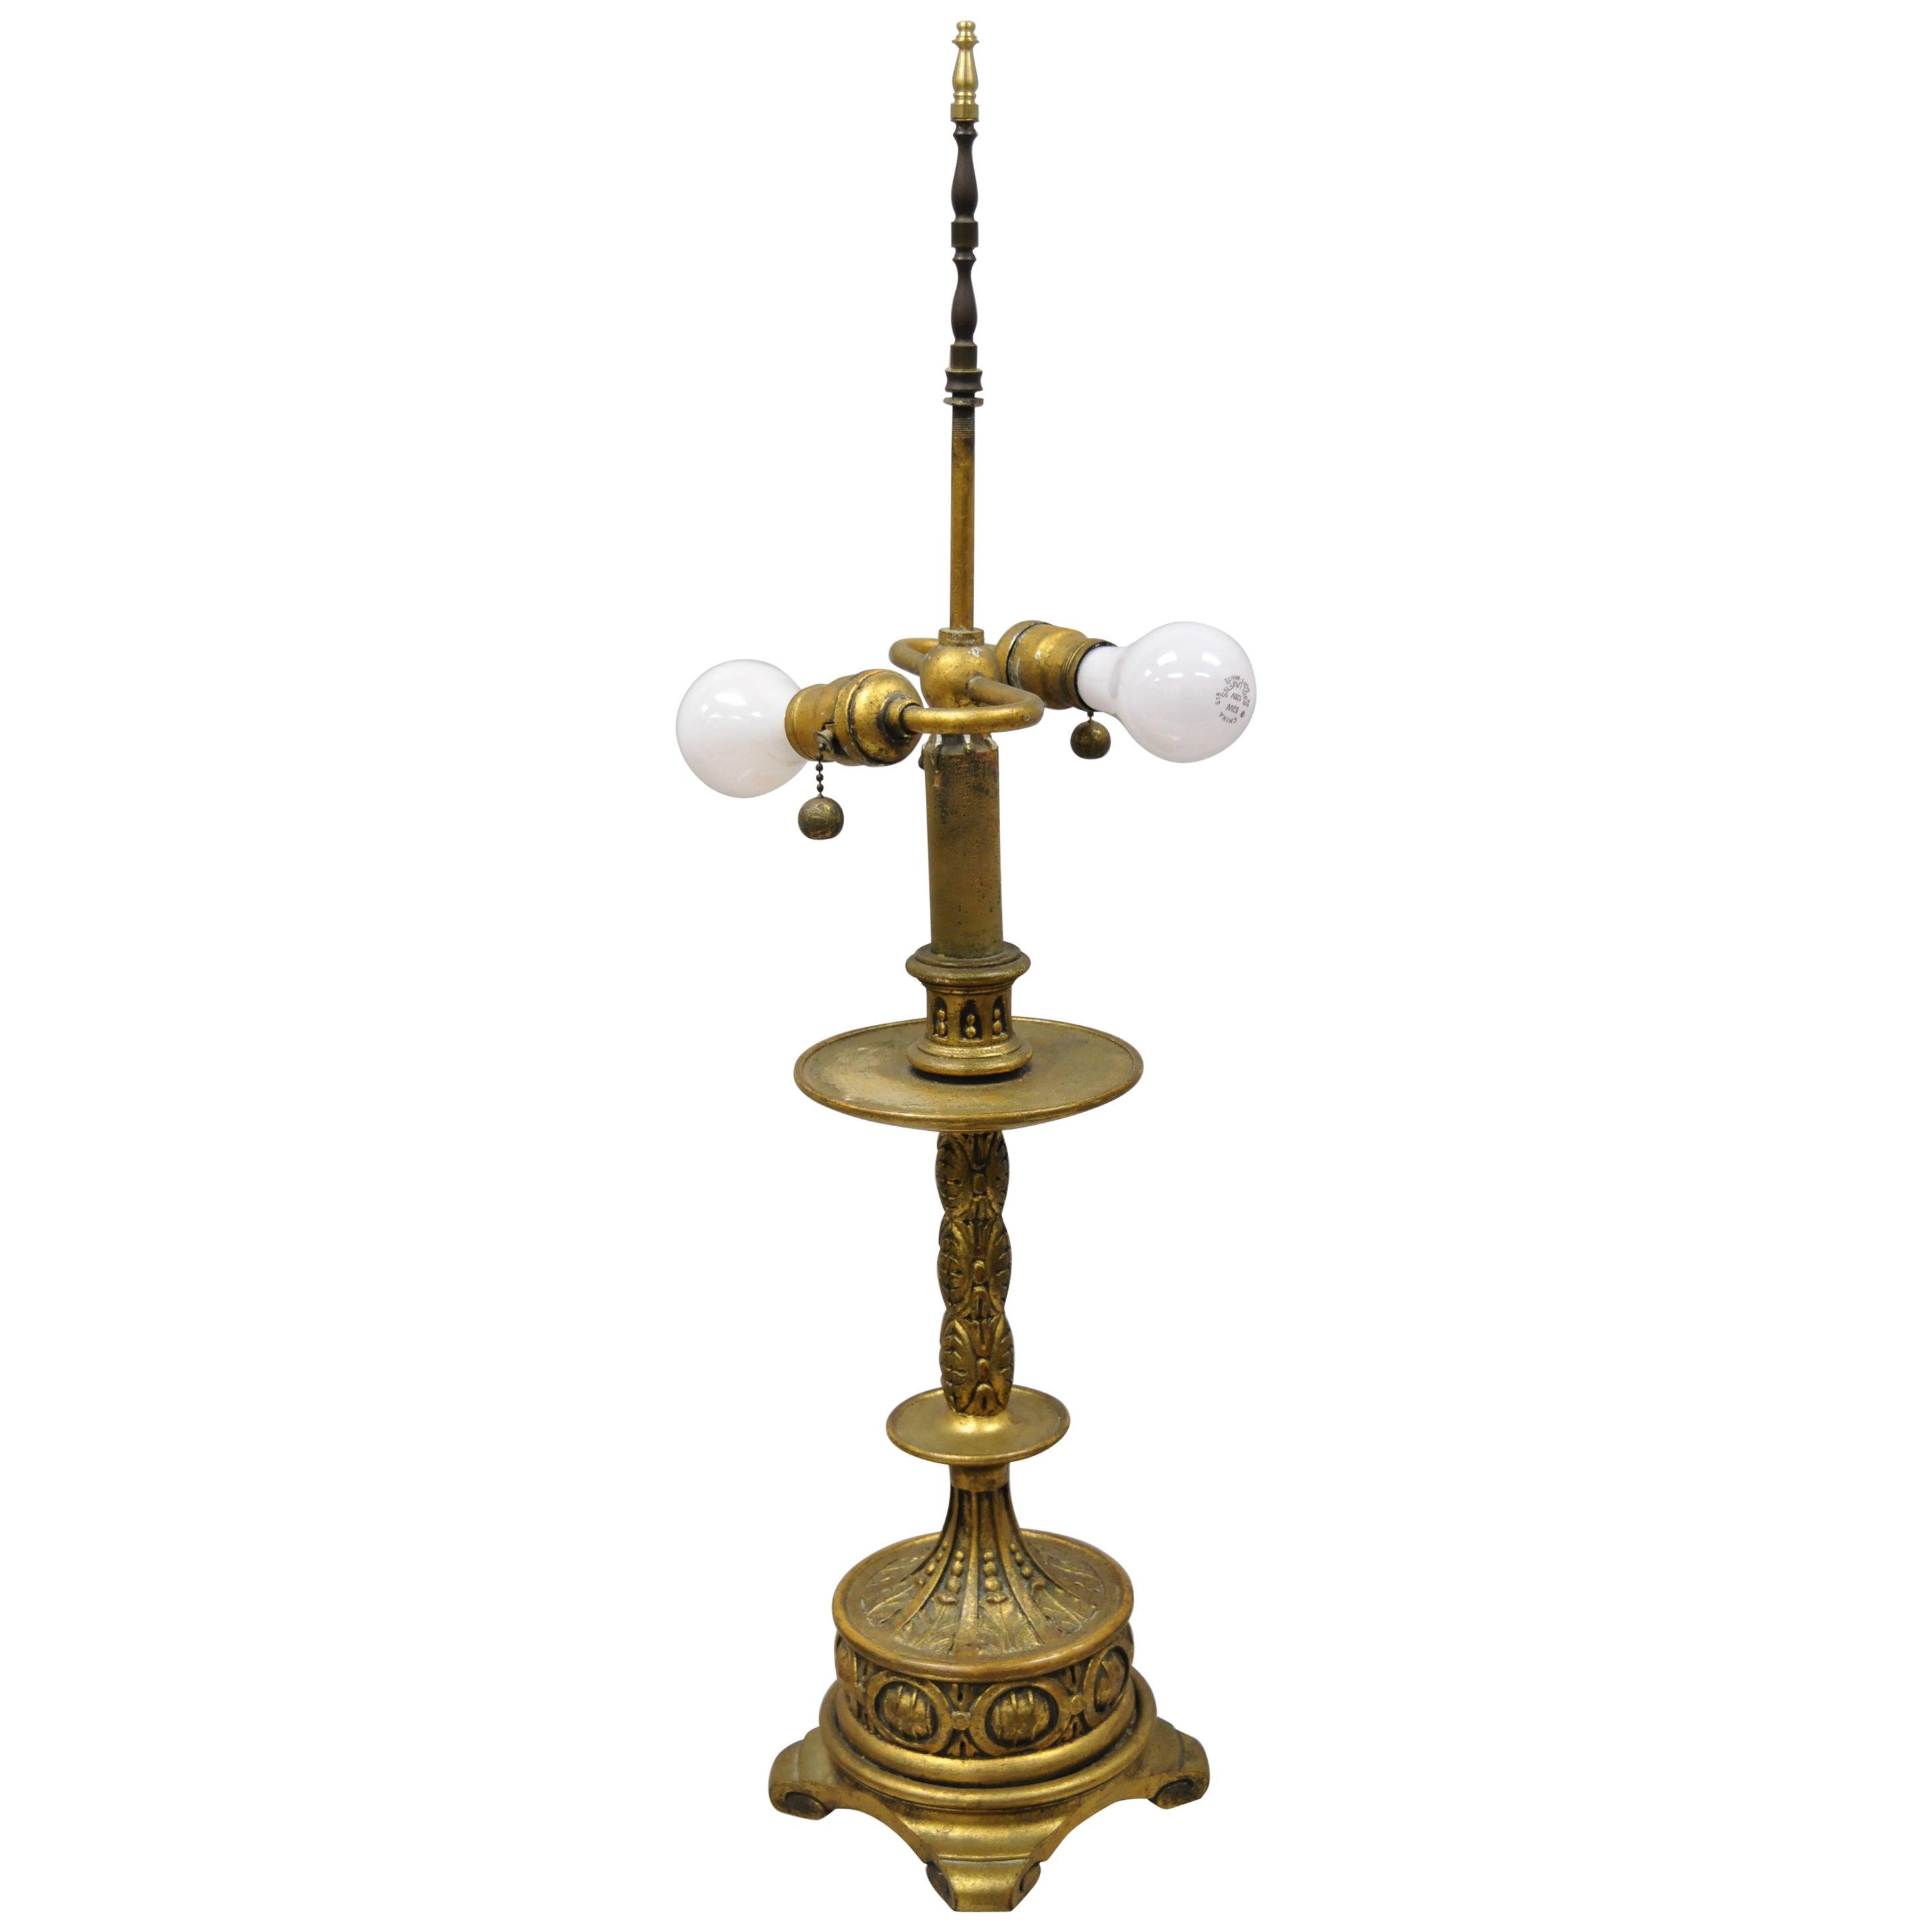 Vintage Italian Gold Giltwood Carved Candle Candelabrum Florentine Table Lamp